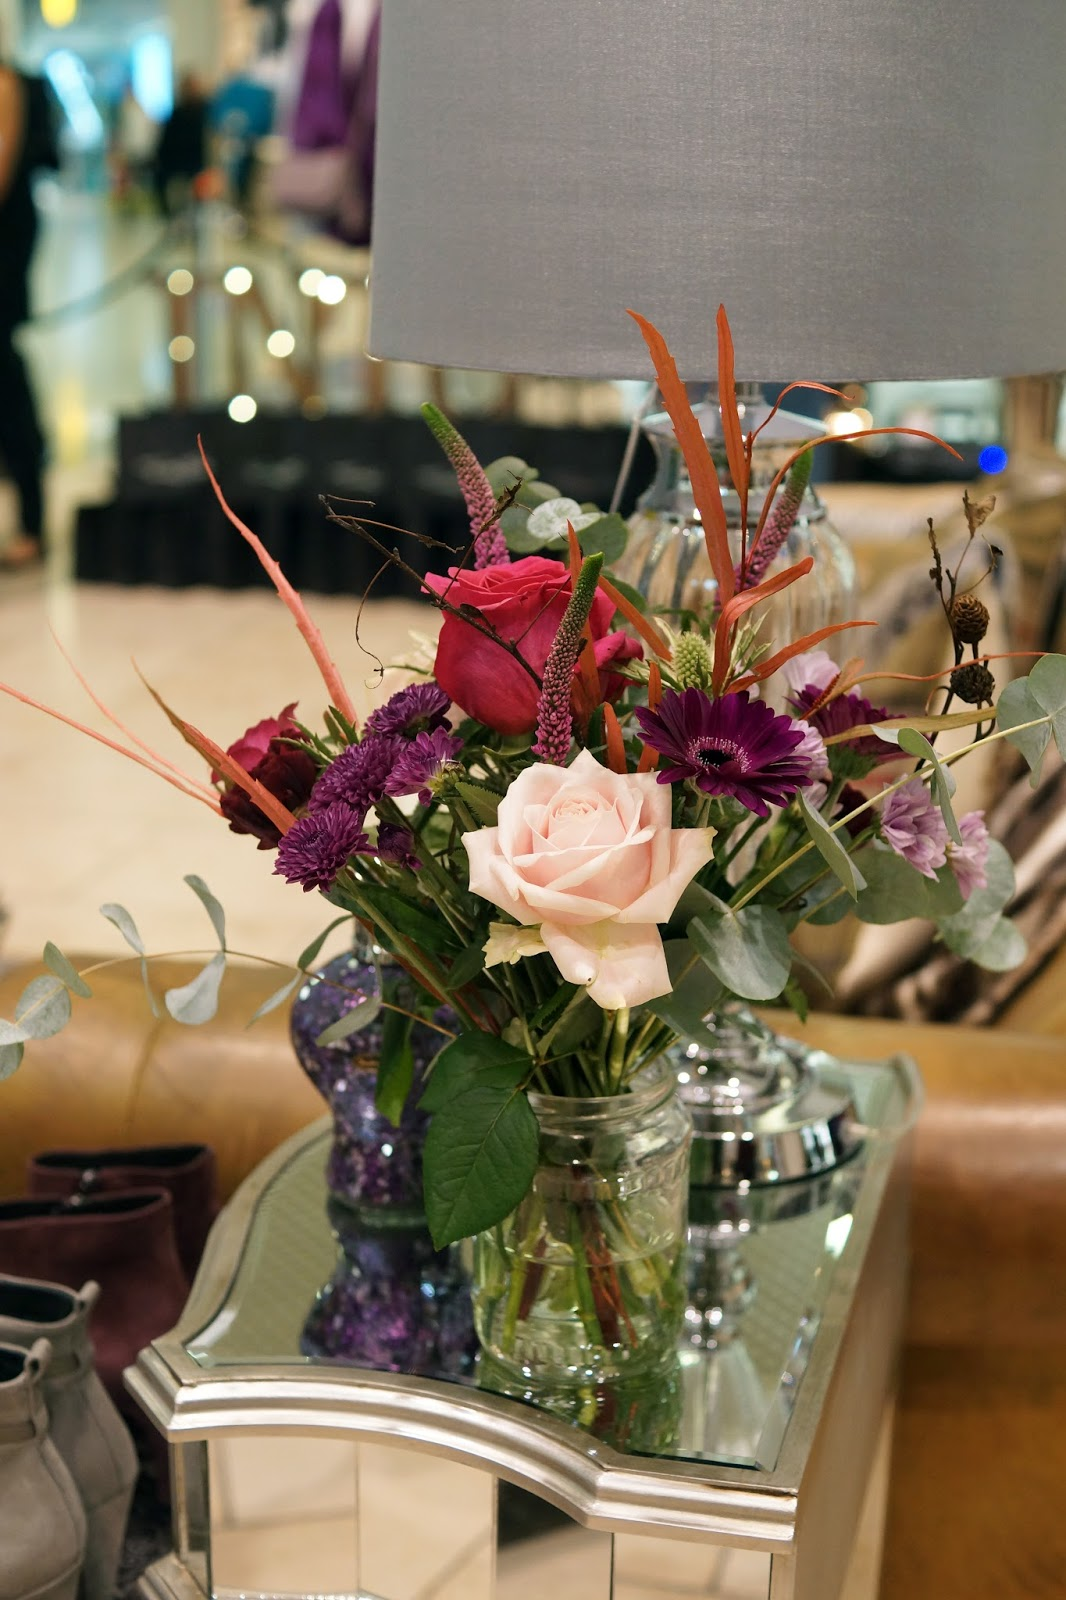 AW16 Style Intu Metrocentre Seasonal Trends North East Bloggers Flowers